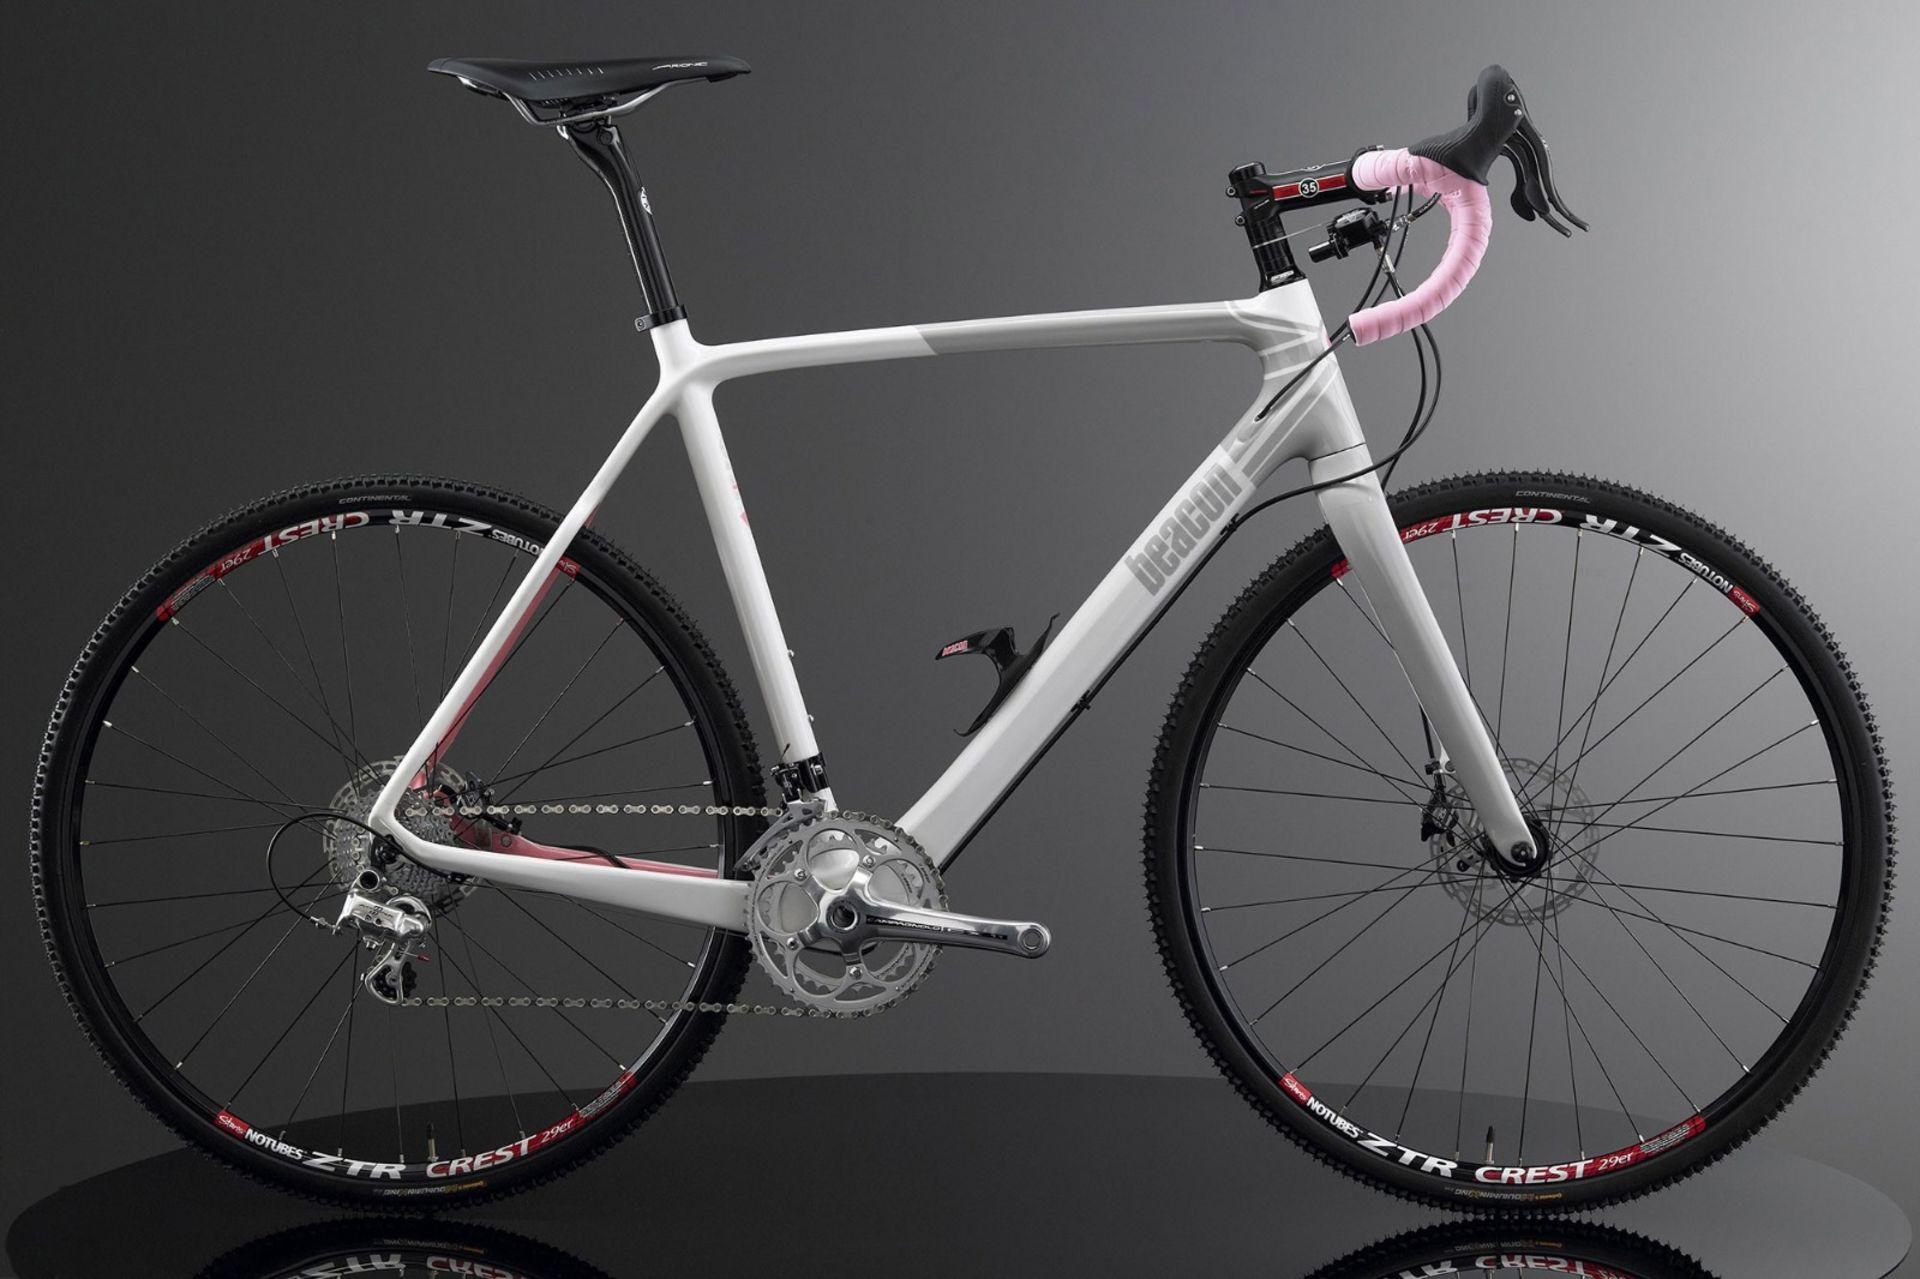 Lot 57 - 1 x Beacon Model BF-45, Size 540, Carbon Fibre Bike Frame in White & Grey.